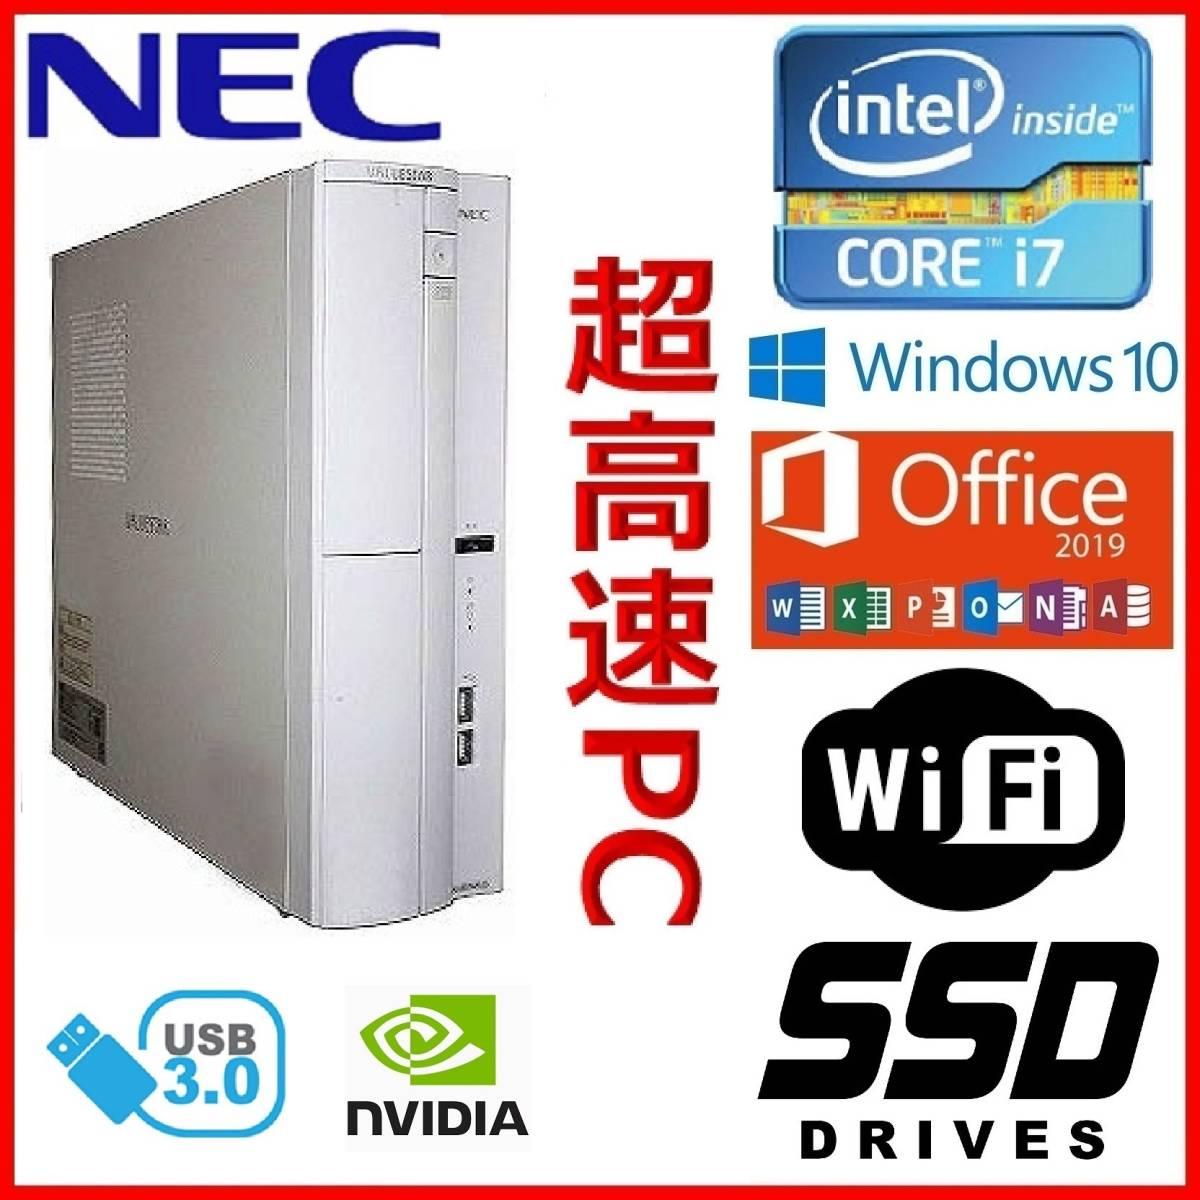 ■NEC■超高速 i7/新品SSD240GB+HDD1TB/メモリ10GB/Wi-Fi/USB3.0/AMDグラボ/Win10/Office2019■VALUESTAR PC-GV286VZGH改■